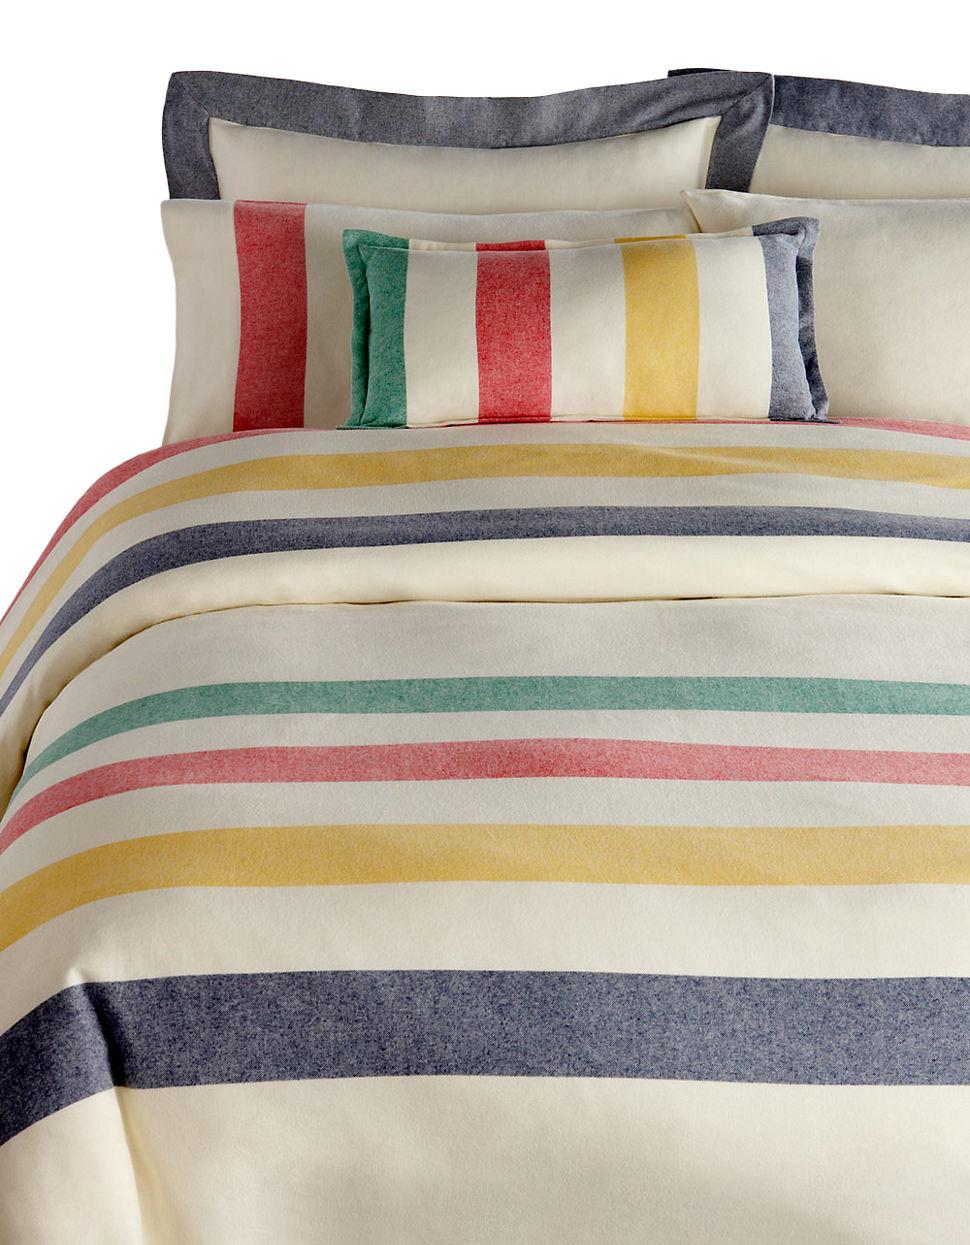 Flannel bedding sheet set hudsons bay buycottarizona Choice Image